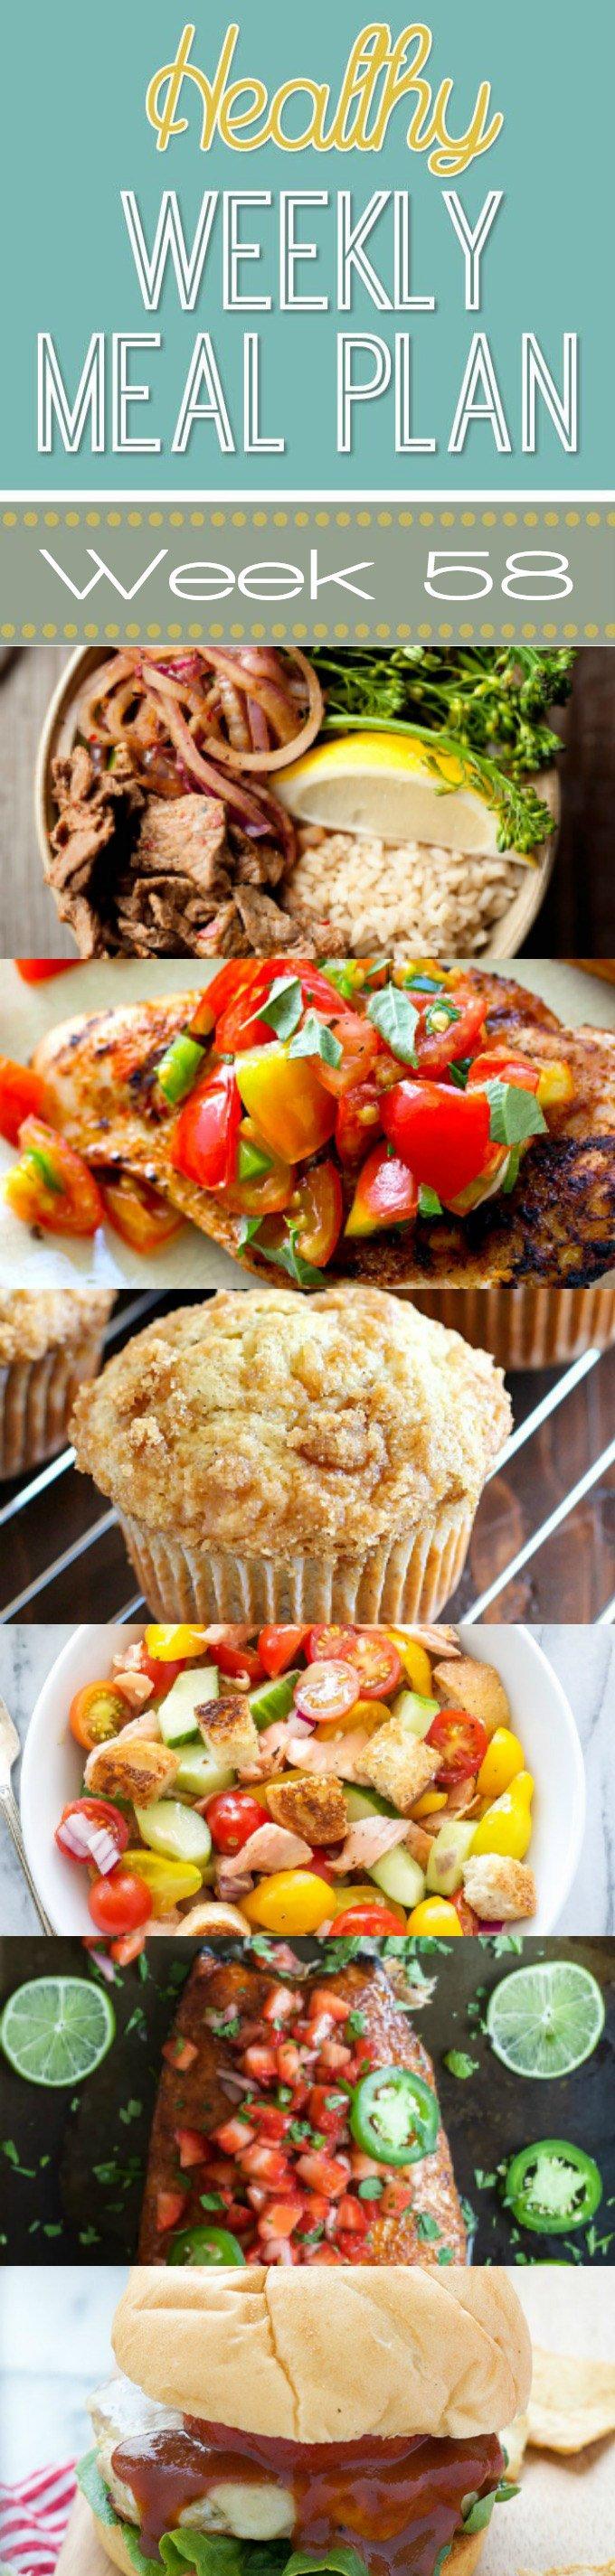 Healthy Weekly Meal Plan #58